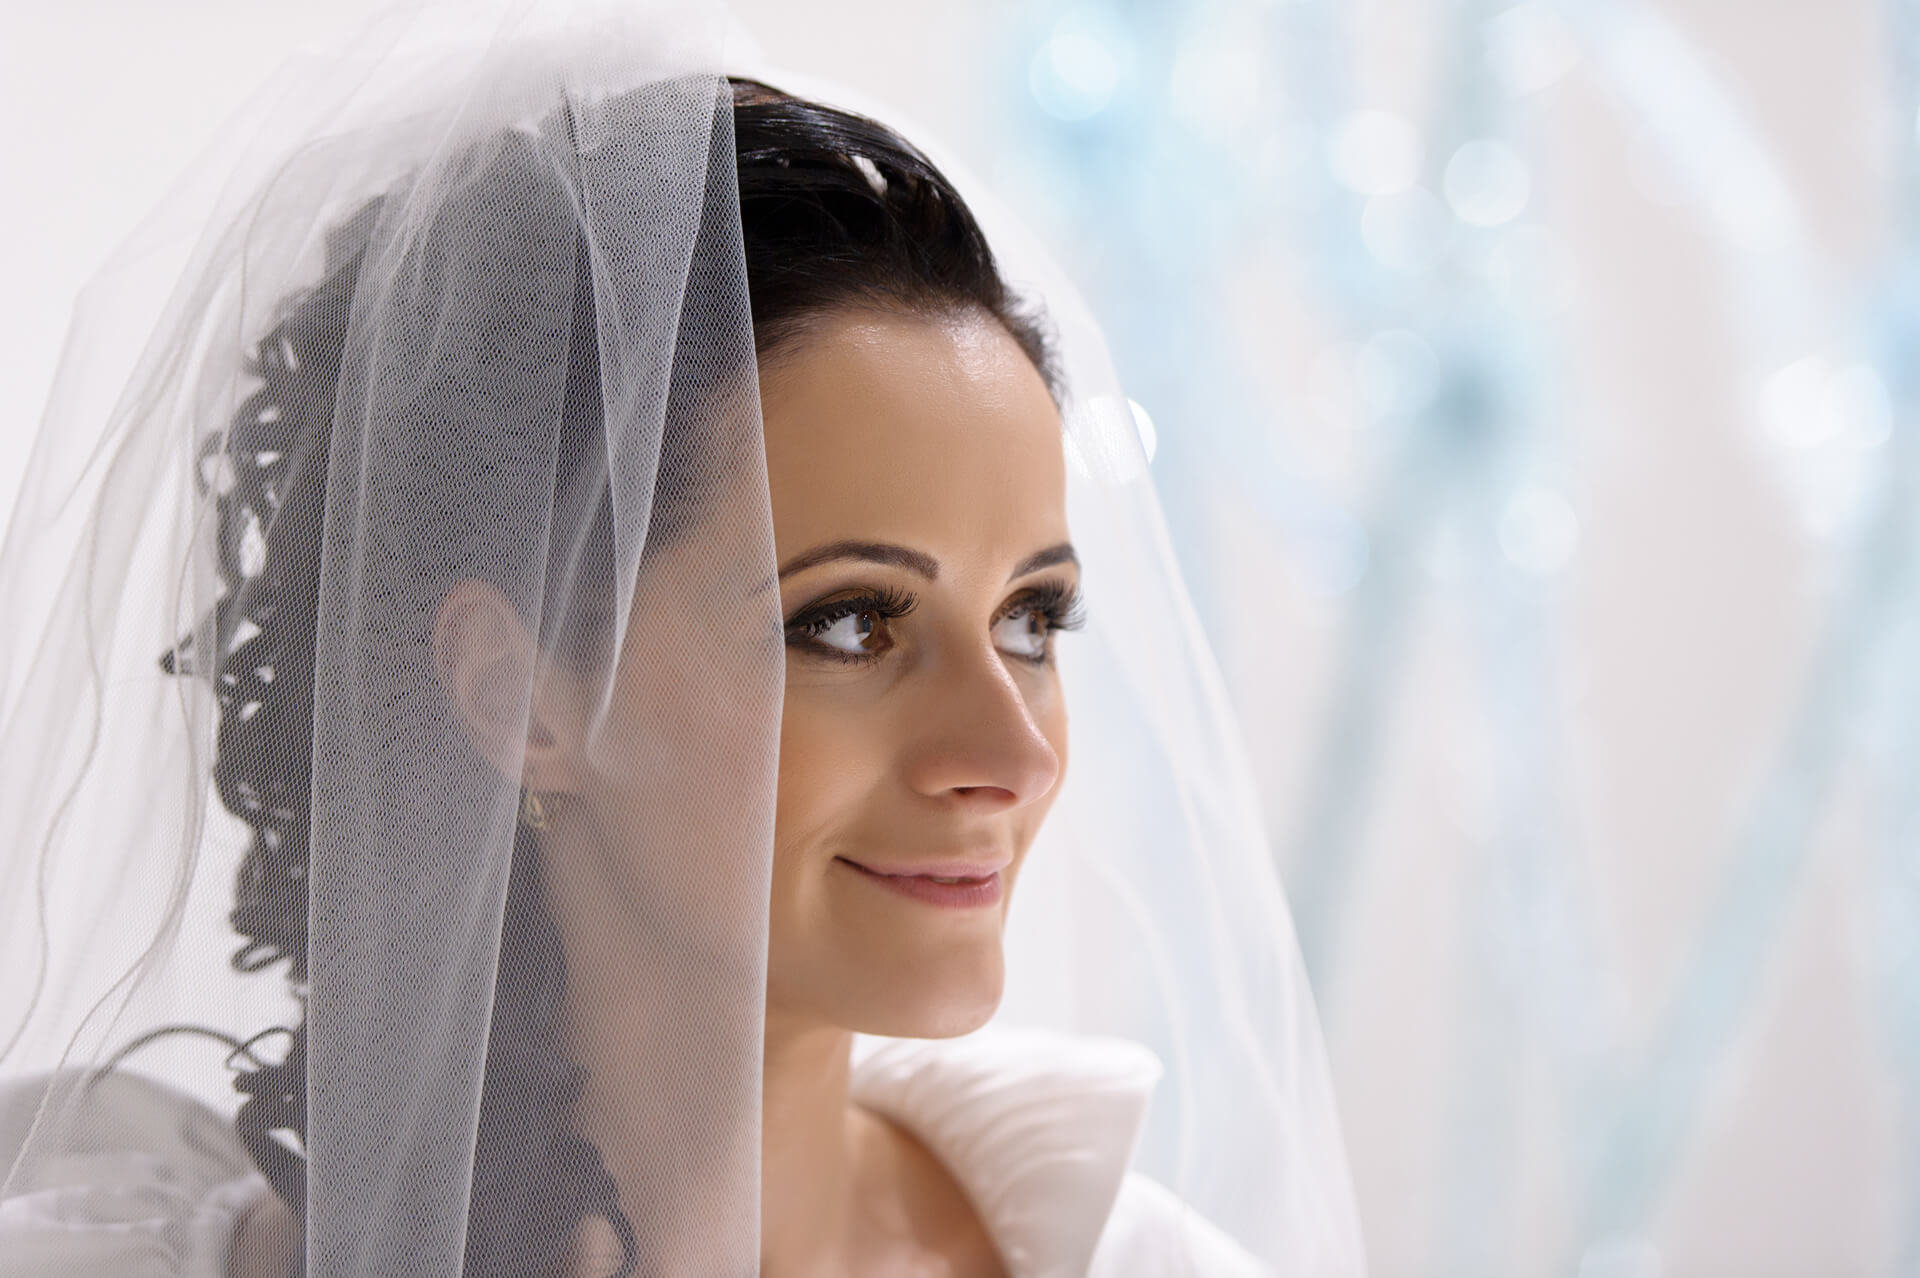 svadba svadobny portrety profesionalne fotenie fotograf Peter Norulak Kosice__37